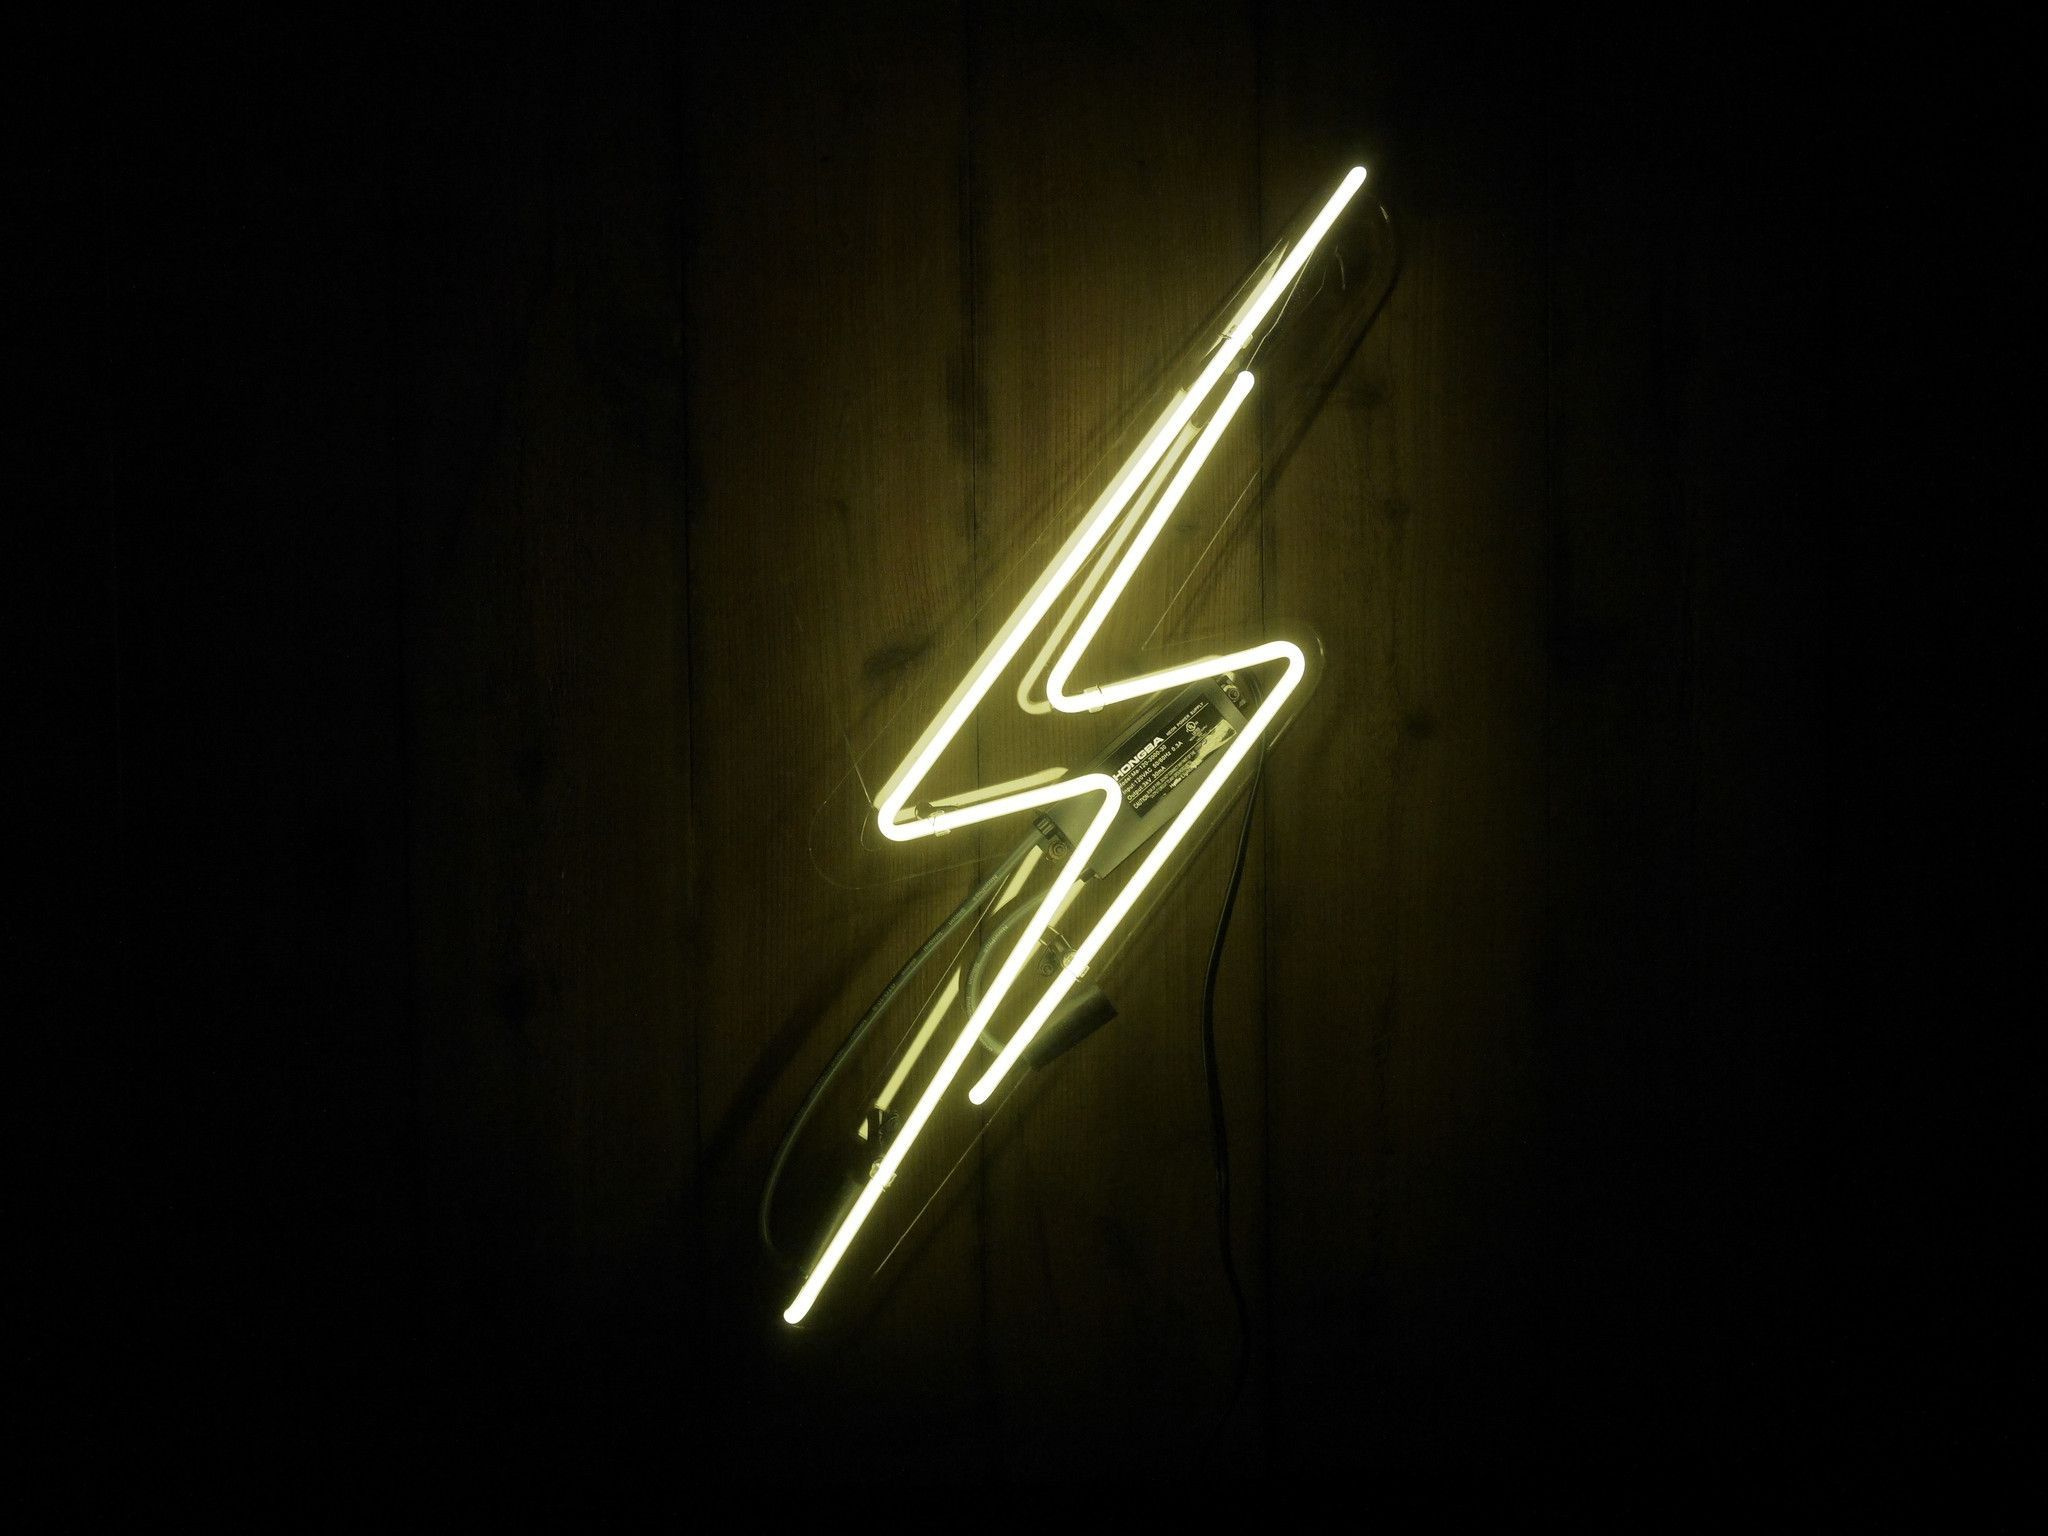 lightning bolt neon sign pinterest neon glow lightning bolt and